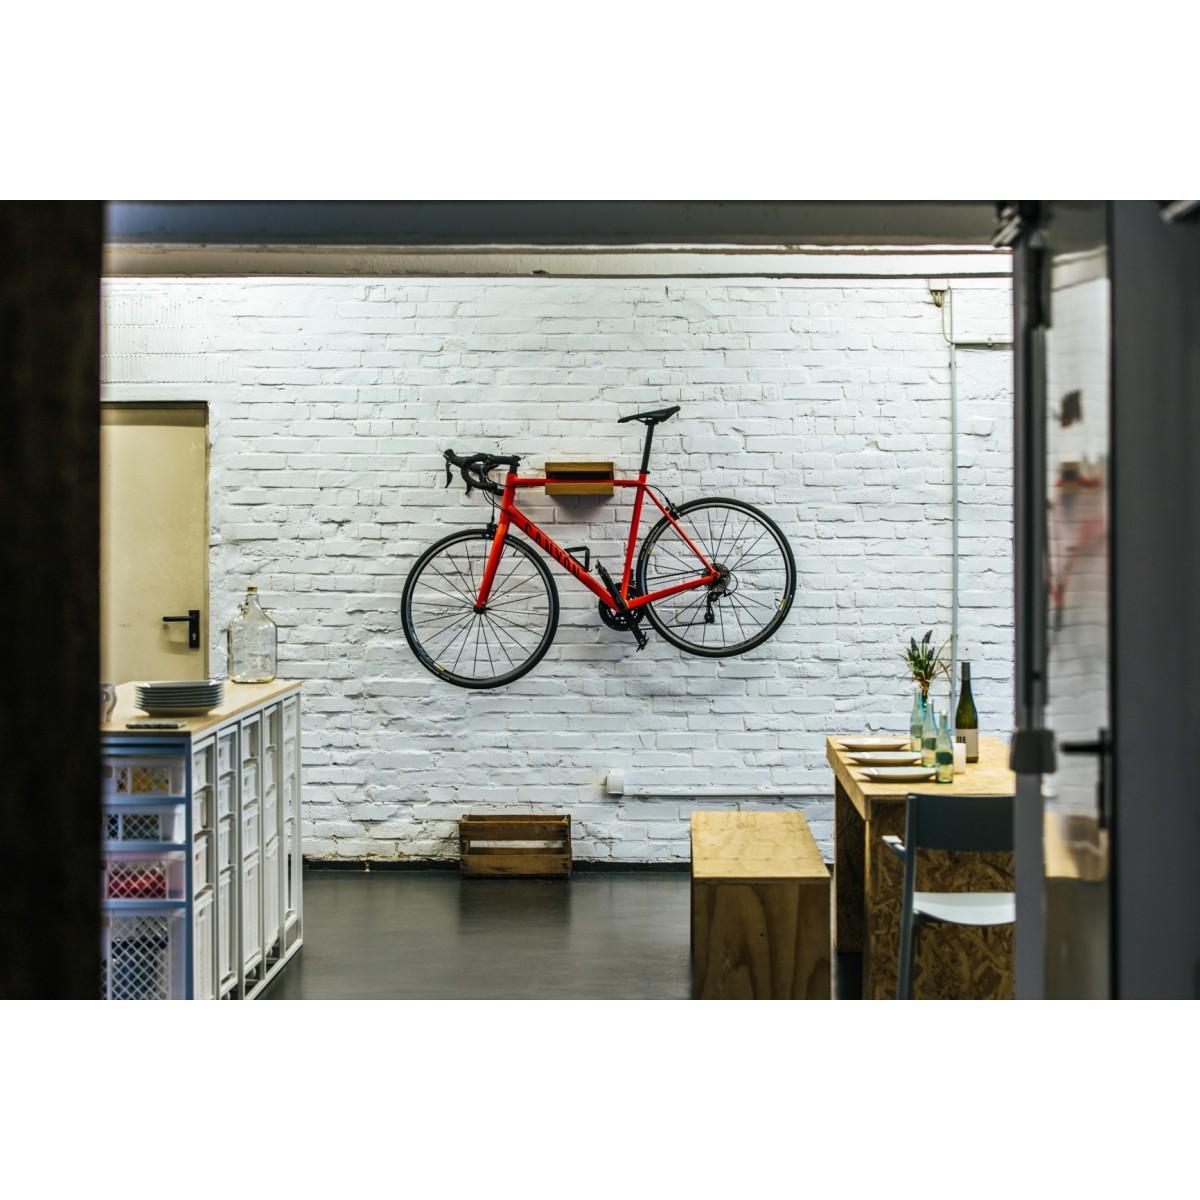 JOHANNES | Fahrrad Wandhalterung | German Design Award Nominee 2019